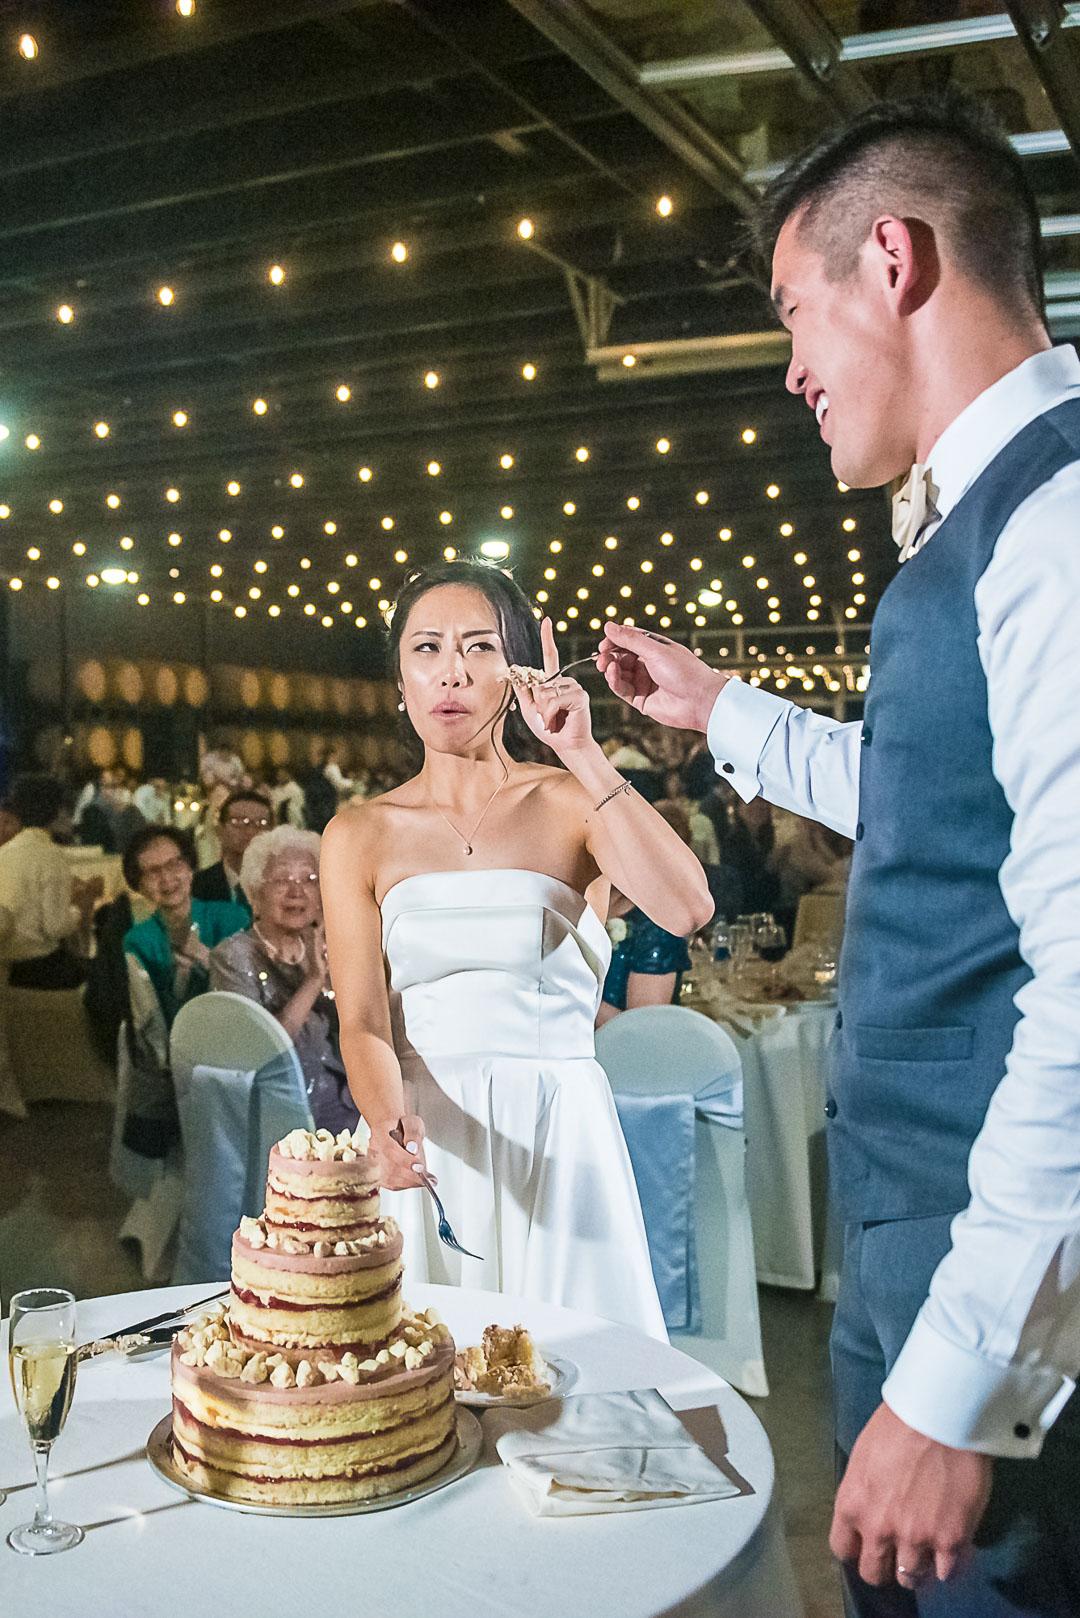 Wedding Photography at Chateau Elan in Braselton, GA